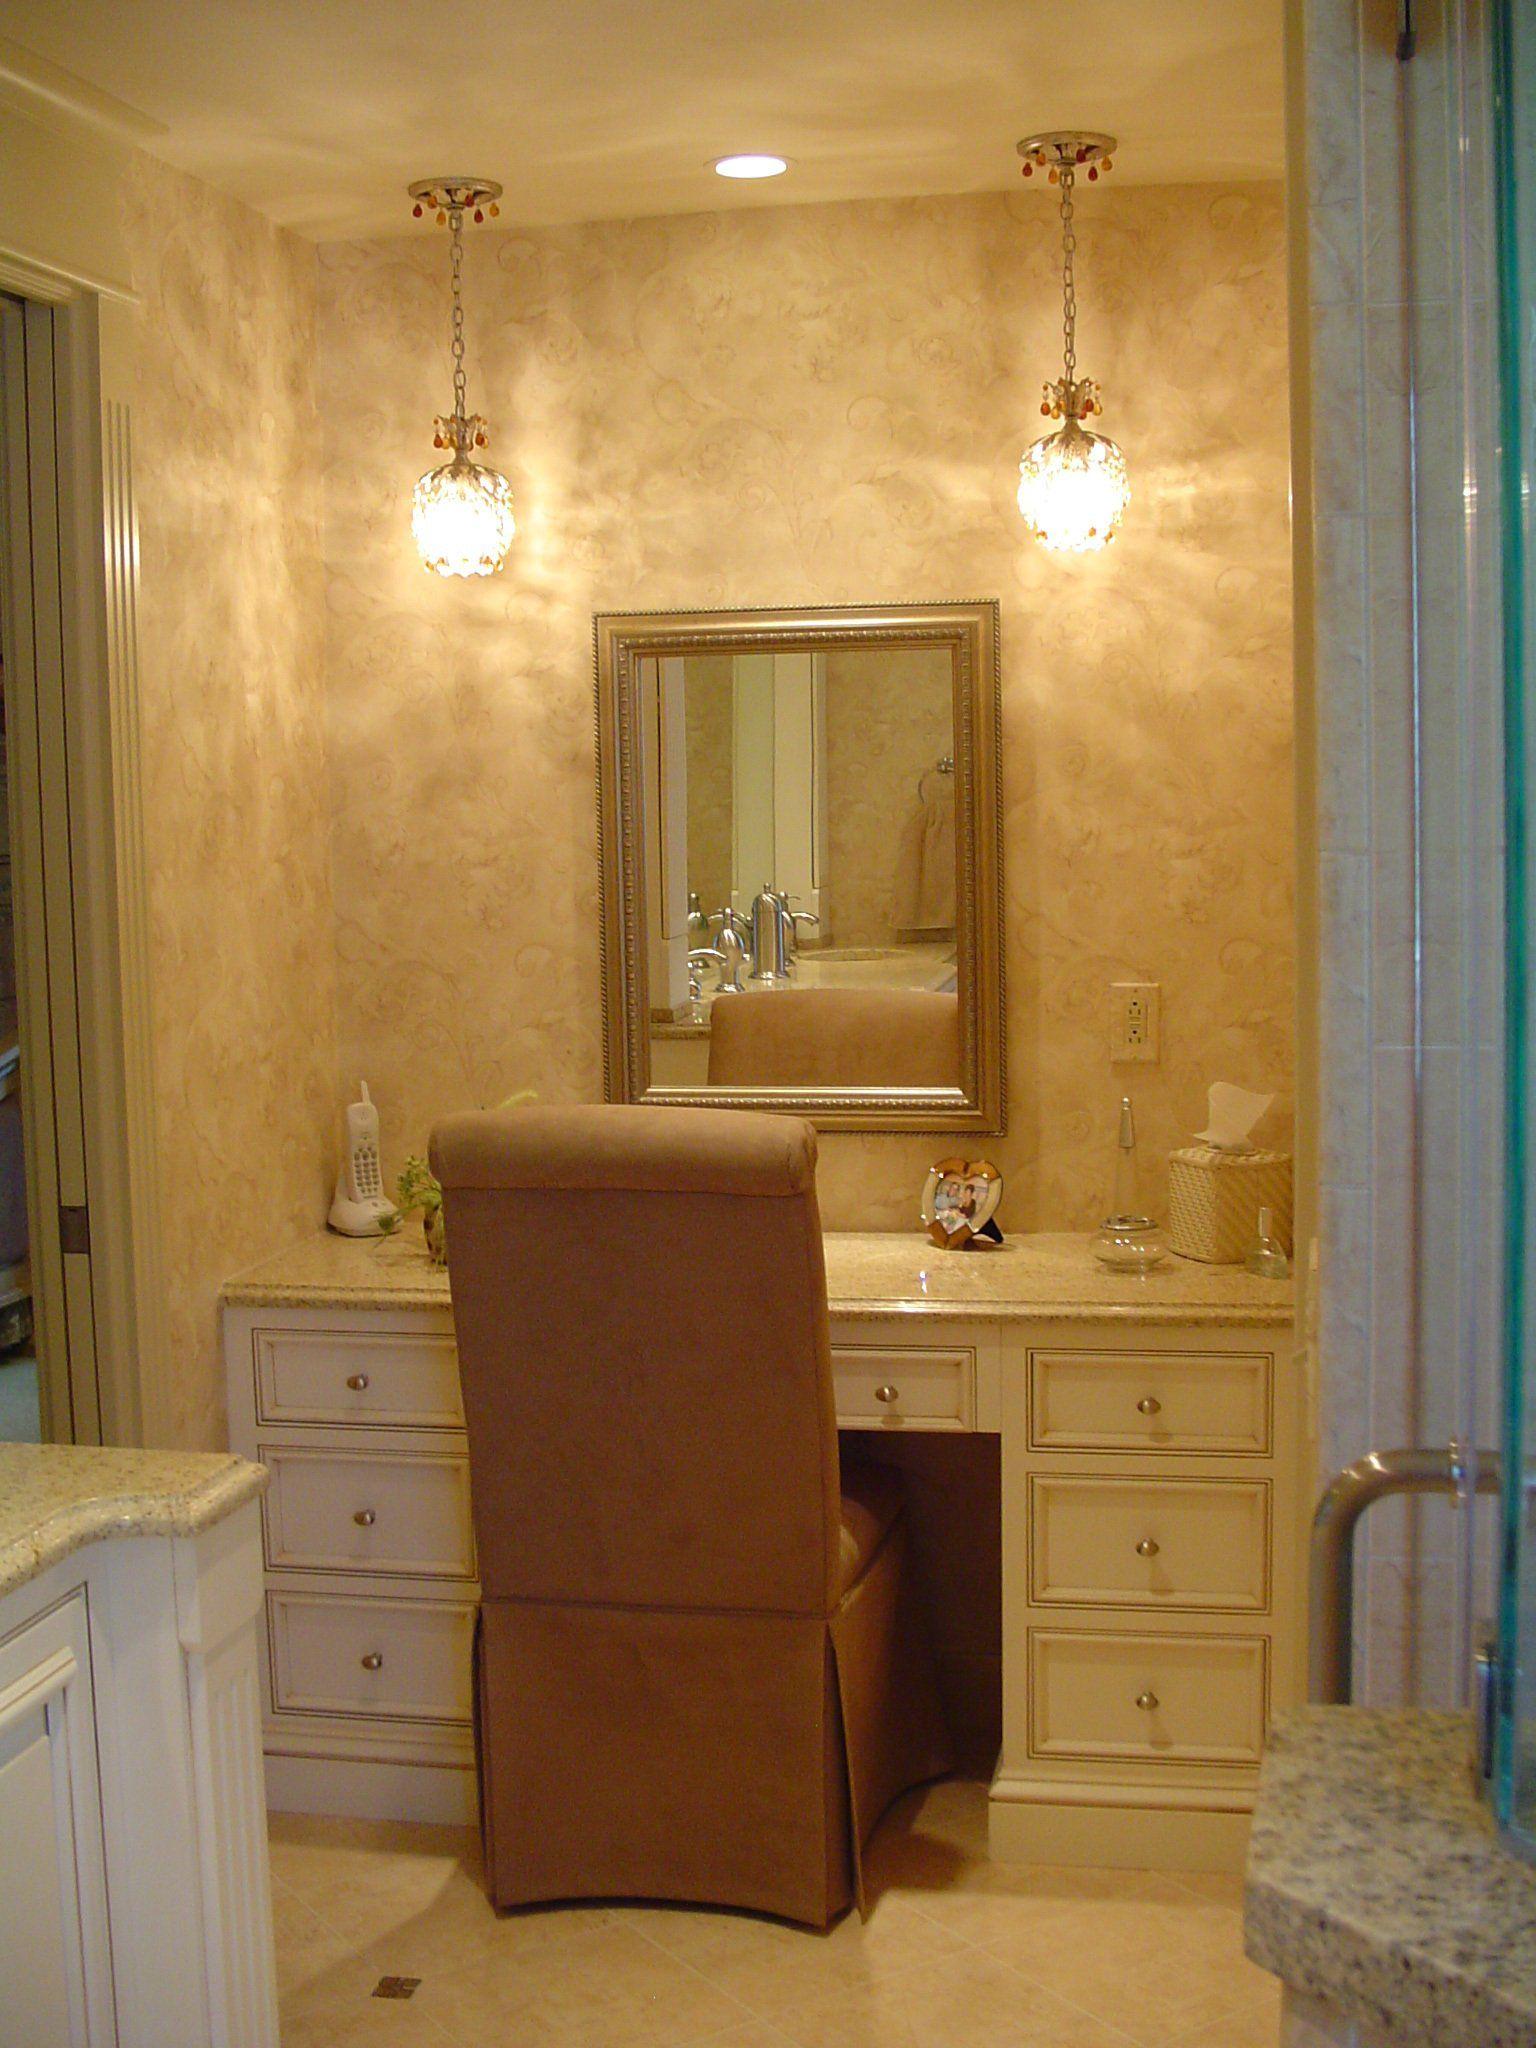 plan your kitchen or bathroom updation with bryce doyle on custom bathroom vanity plans id=88951